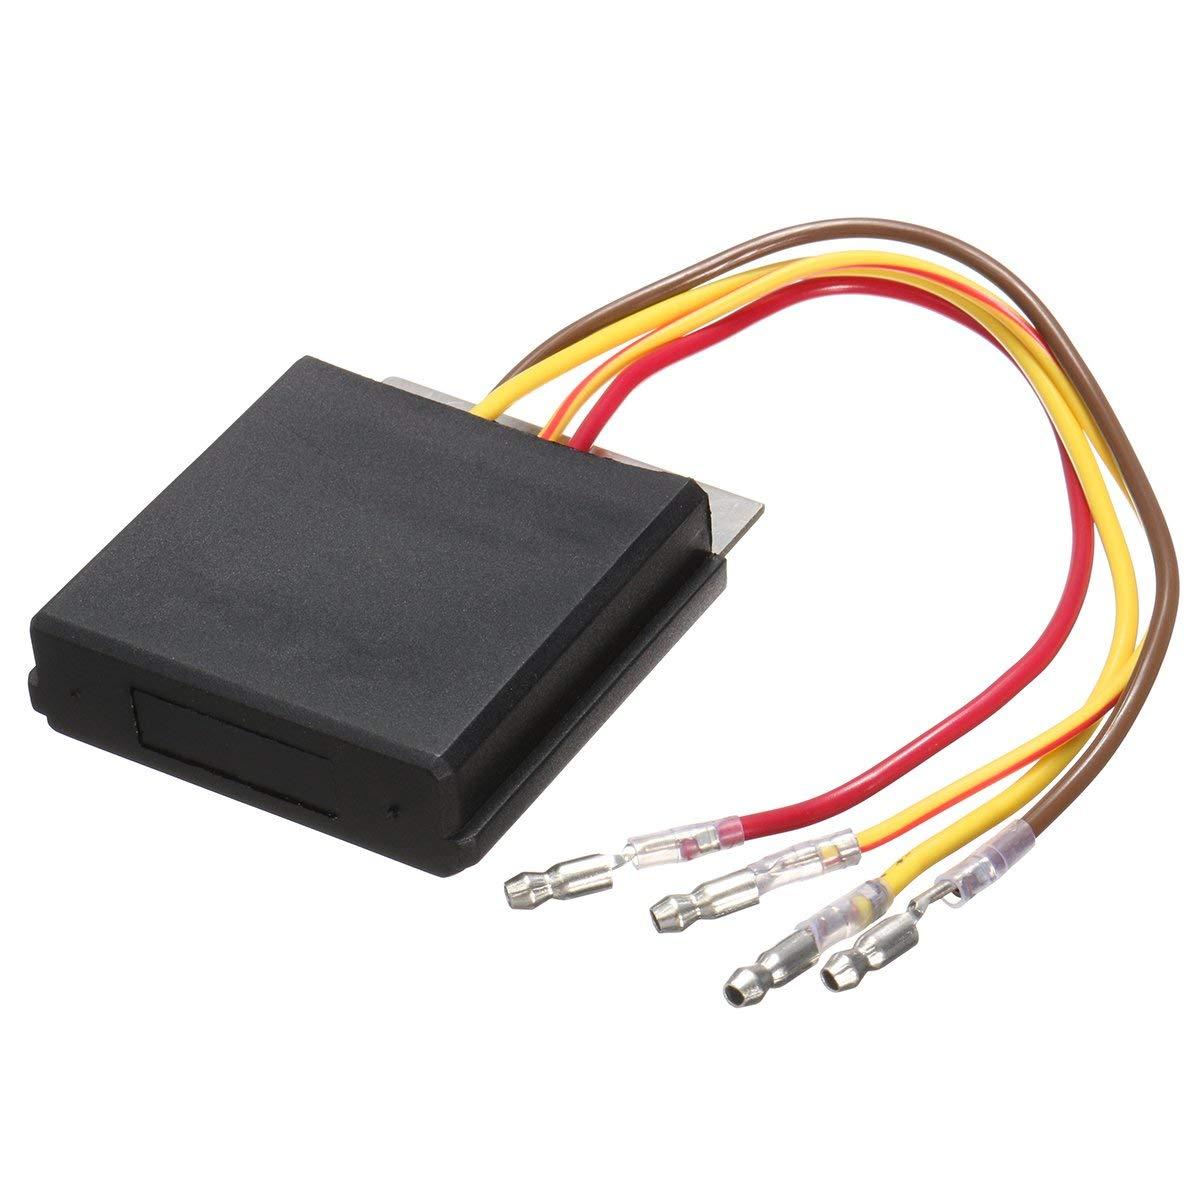 Zz Pro Mosfet Voltage Regulator Rectifier For Polaris Ranger 500//700 RZR 800 Sportsman 500//700//800 2007 2008 2009 2010 OEM Repl.# 4011925 4012384 4011569